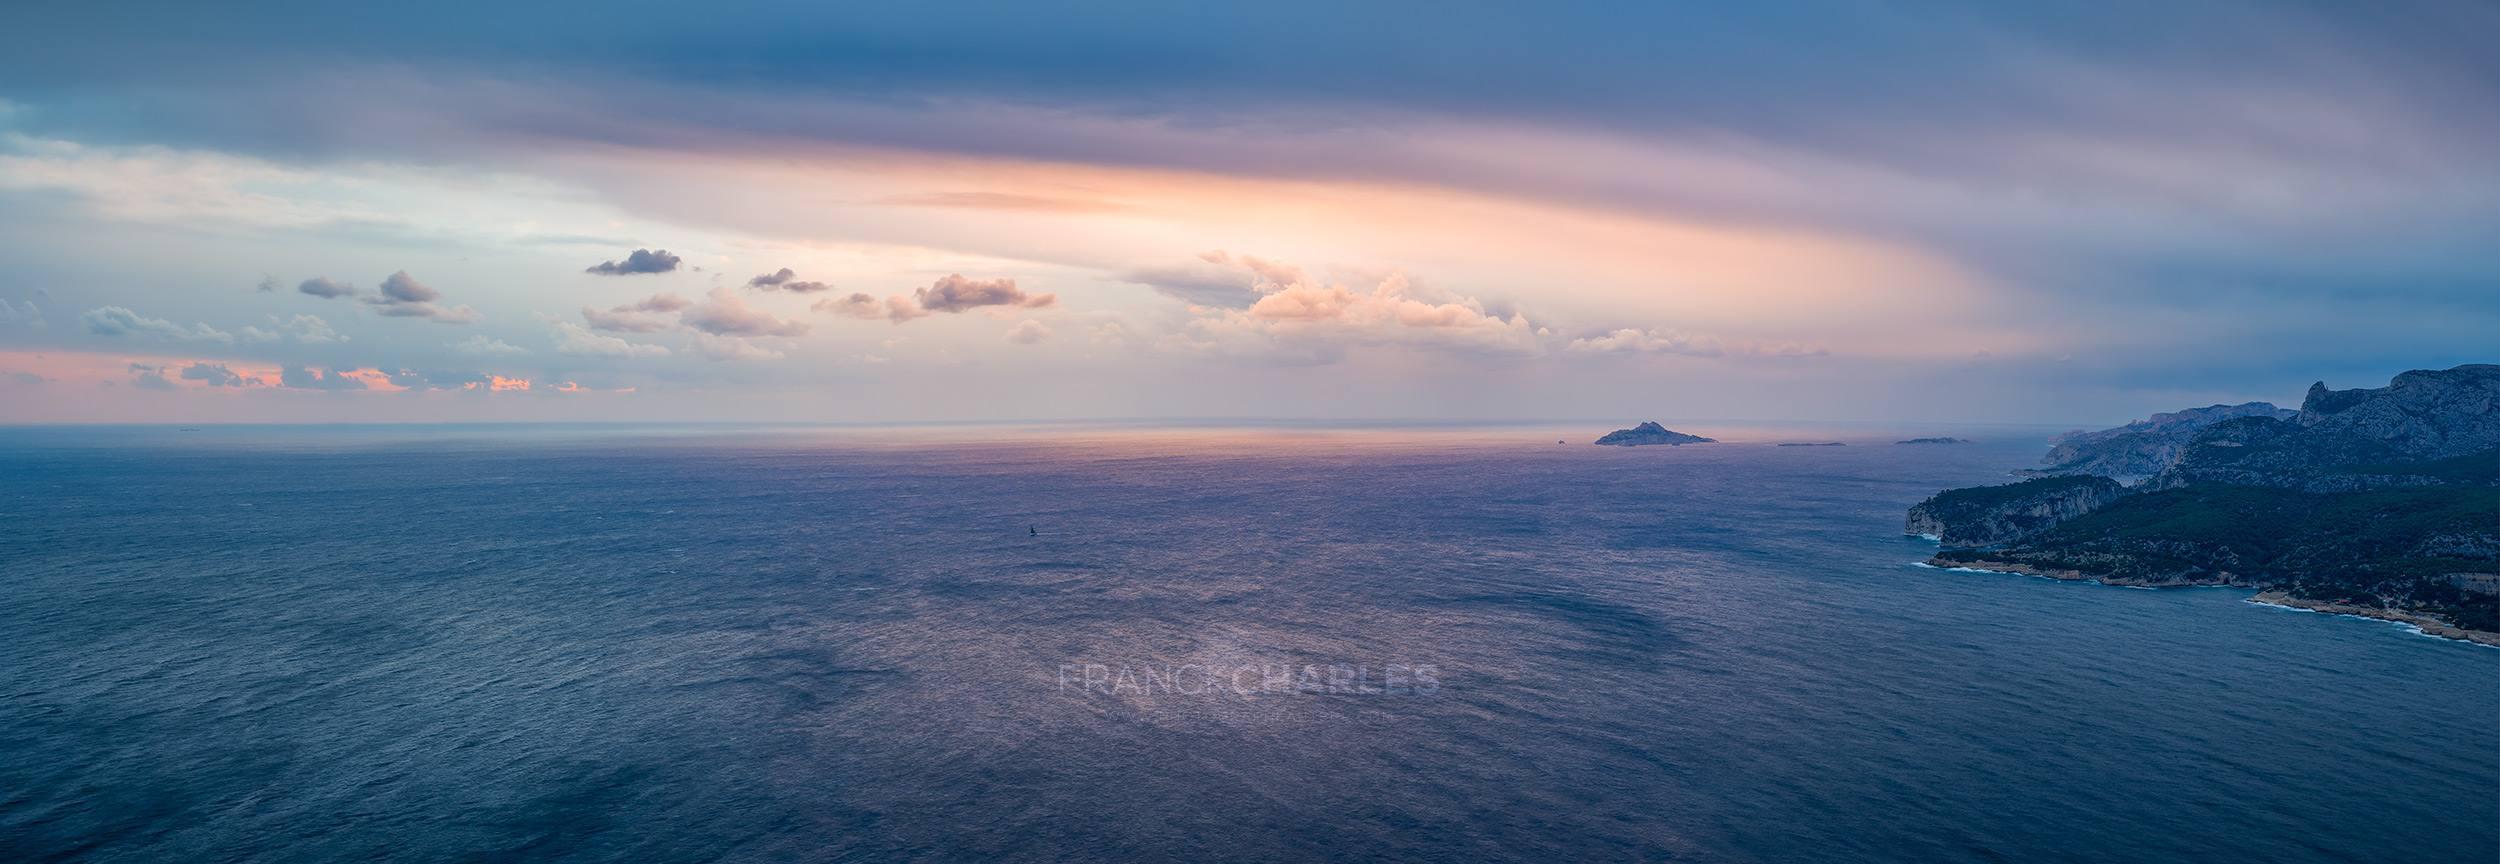 Méditerranée - Franck CHARLES